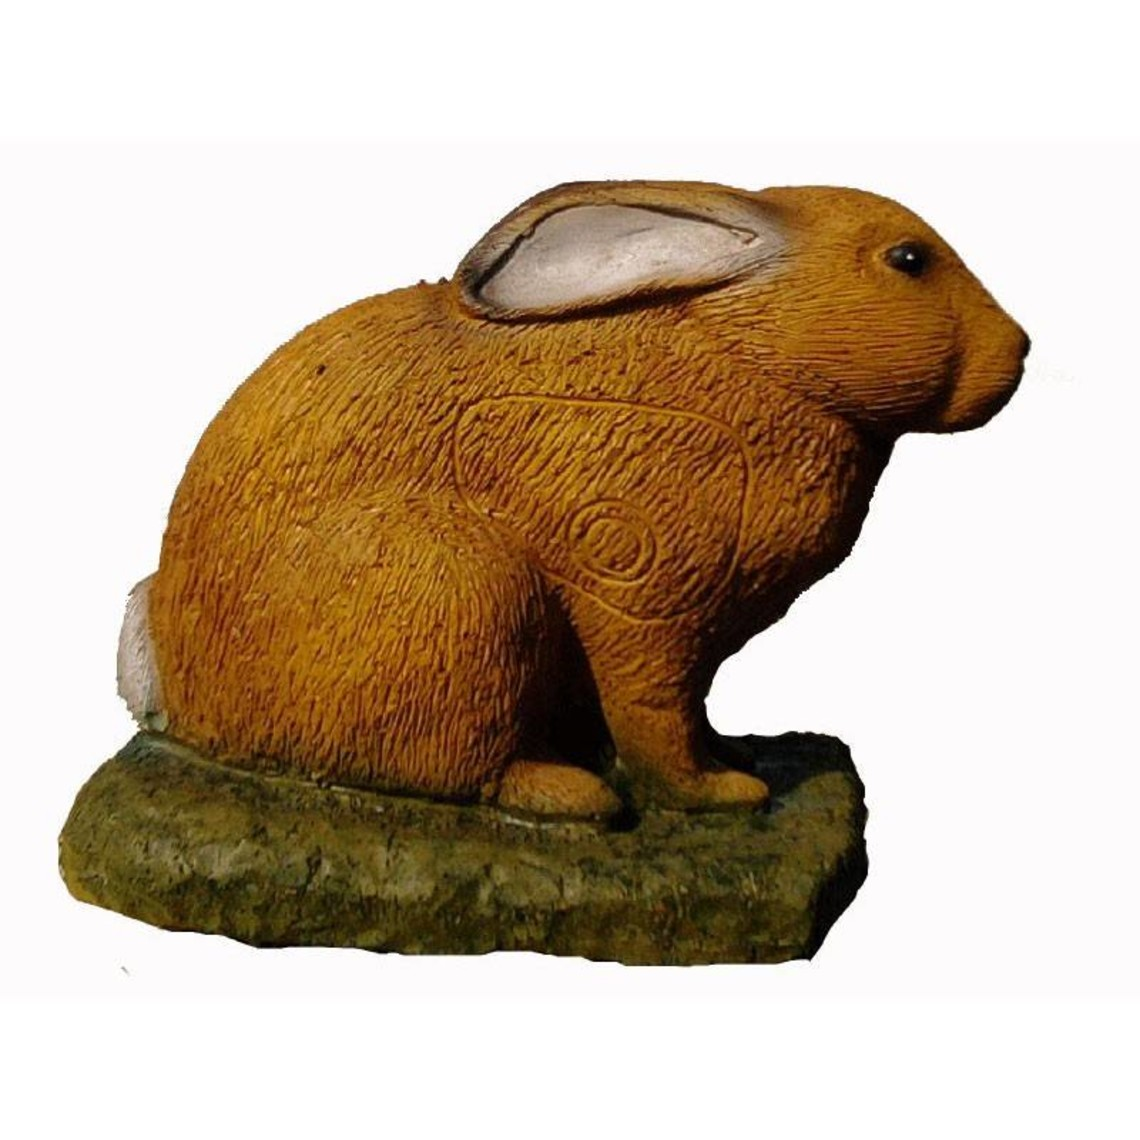 IBB 3D hukande europeisk hare